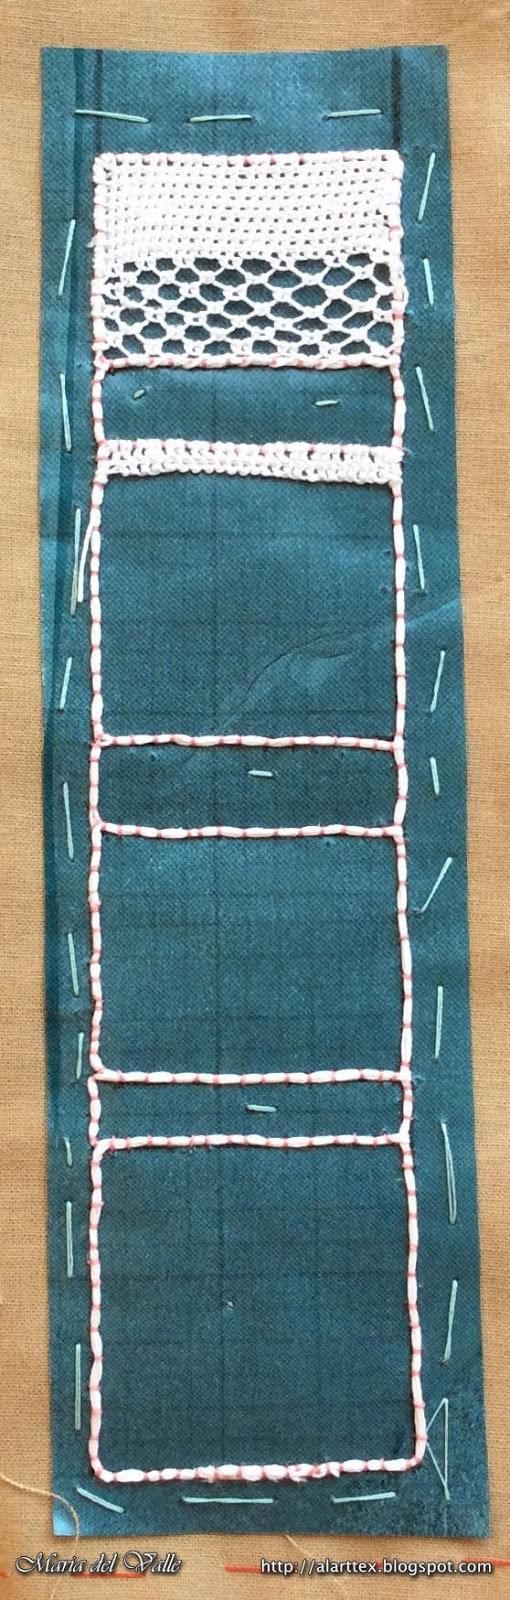 Needle Lace Tutorial - Bookmark Sampler 1 - 1